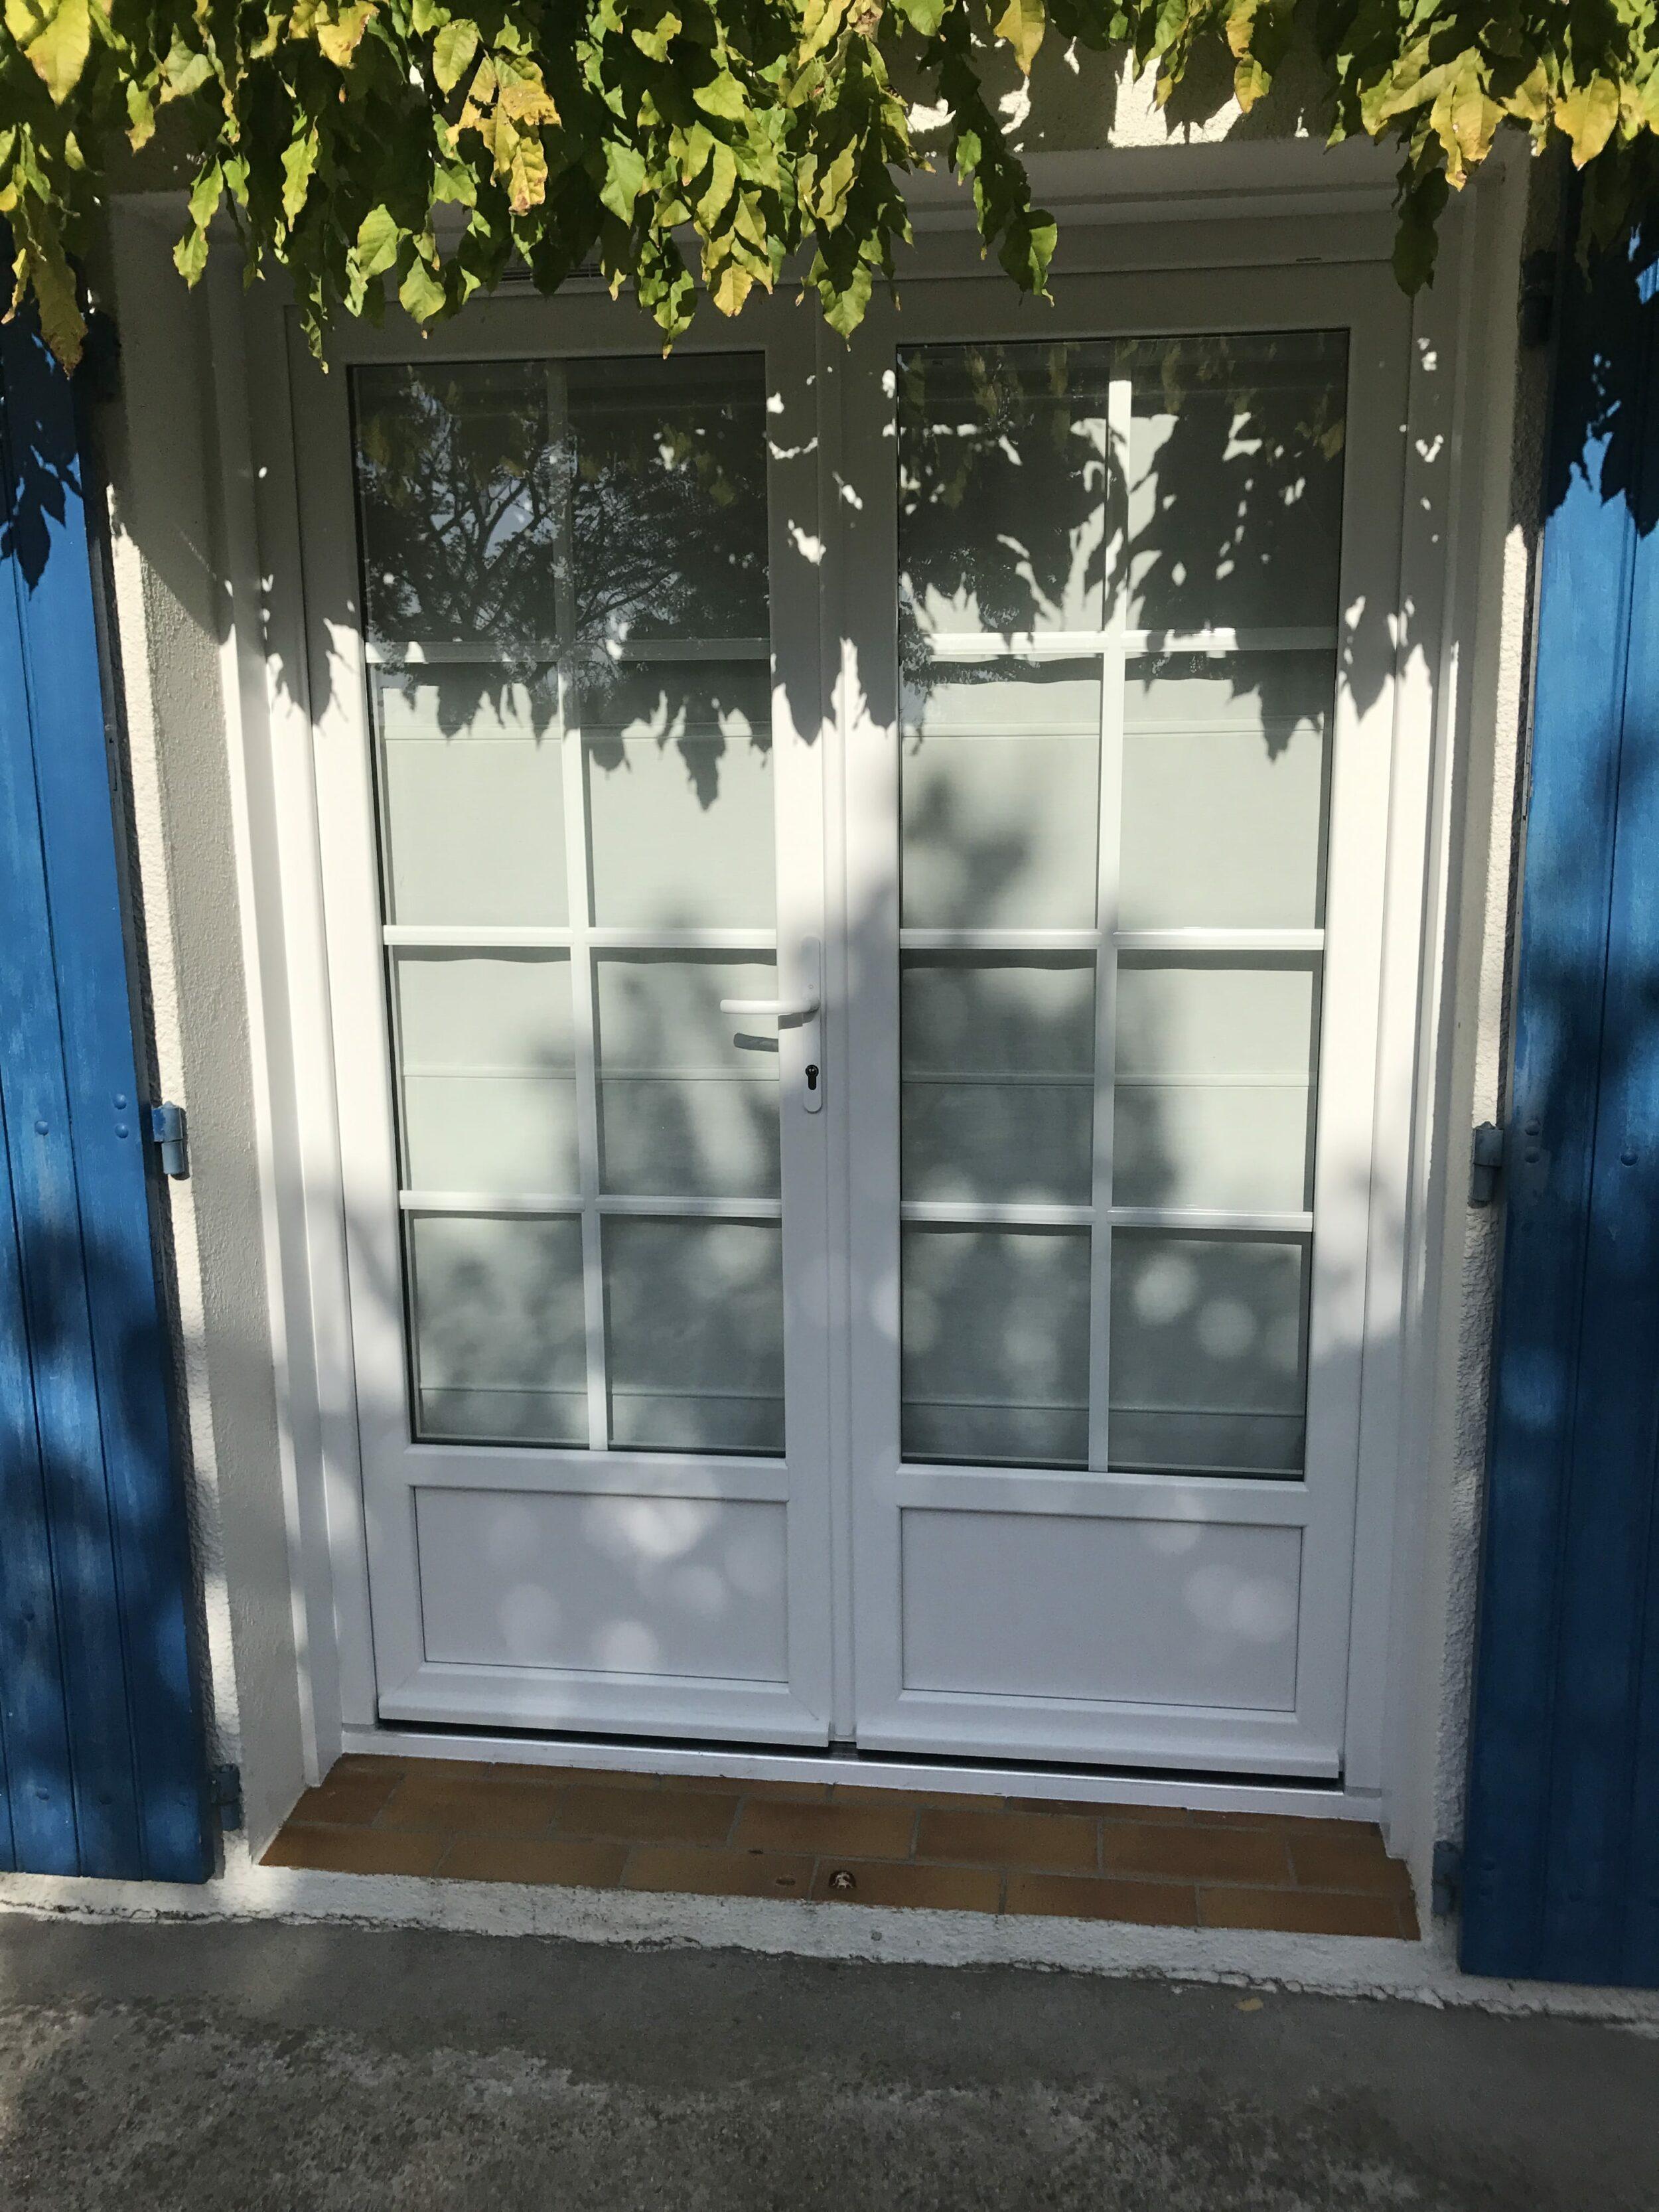 solabaie niort pose de 3 portes fen tres pvc blanches niort 79. Black Bedroom Furniture Sets. Home Design Ideas